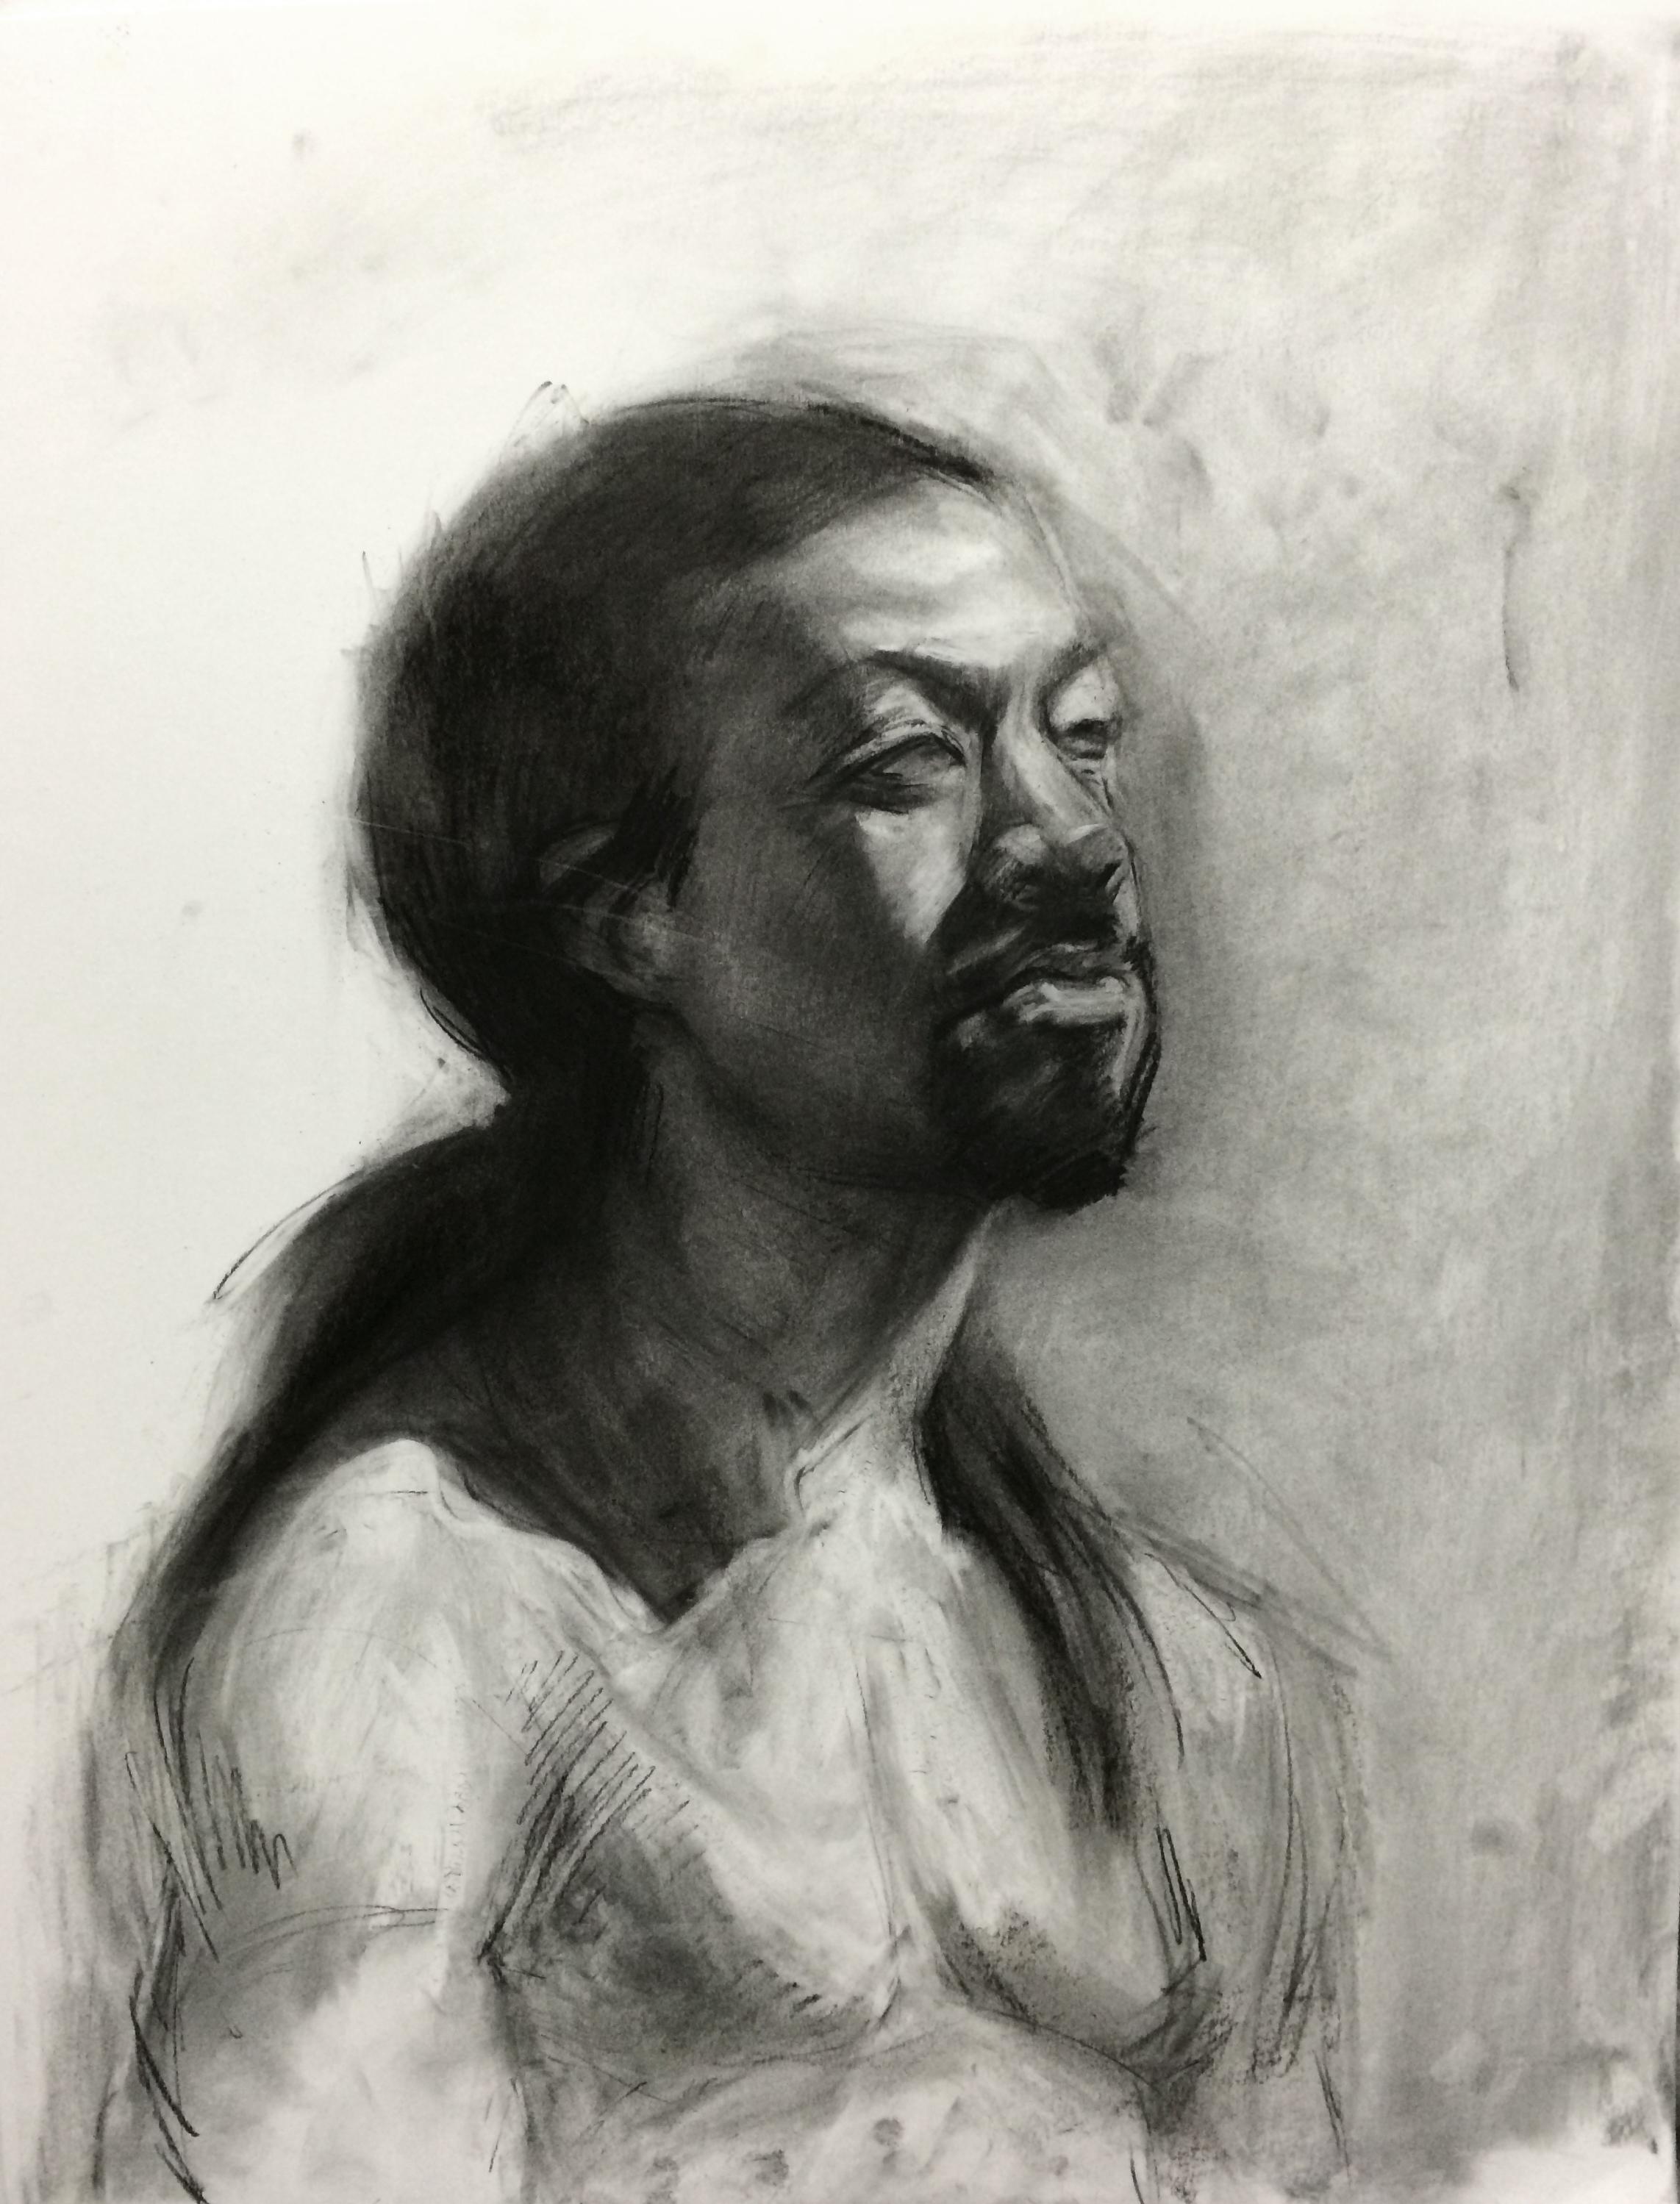 Portrait / 19x24 / Charcoal on Paper / 2015